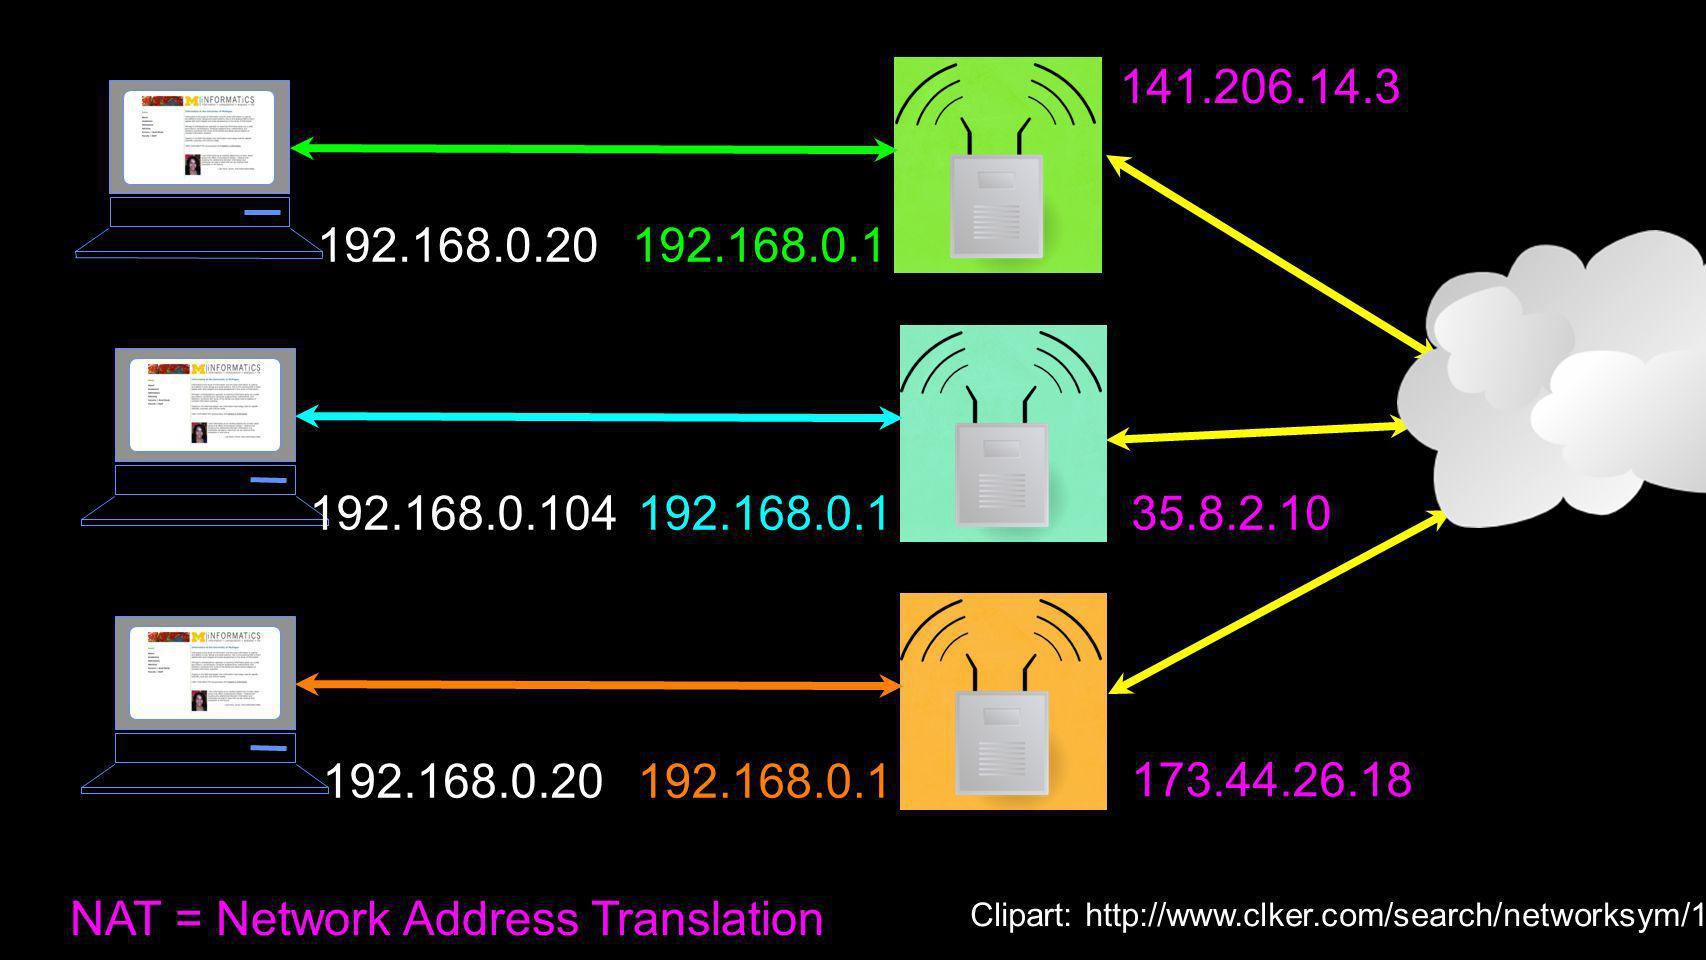 NAT = Network Address Translation